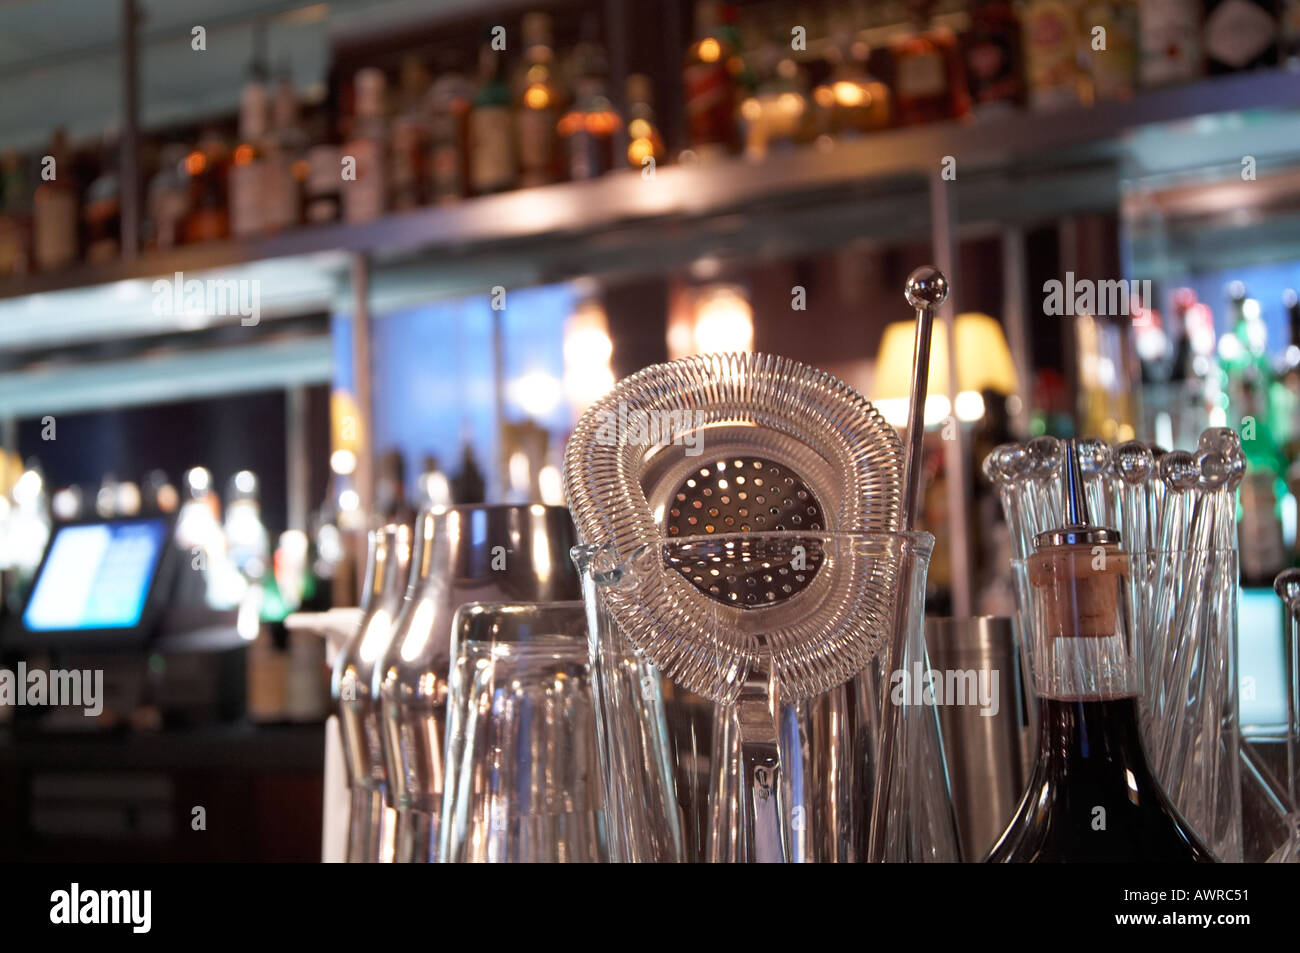 Back Bar Stockfotos & Back Bar Bilder - Alamy